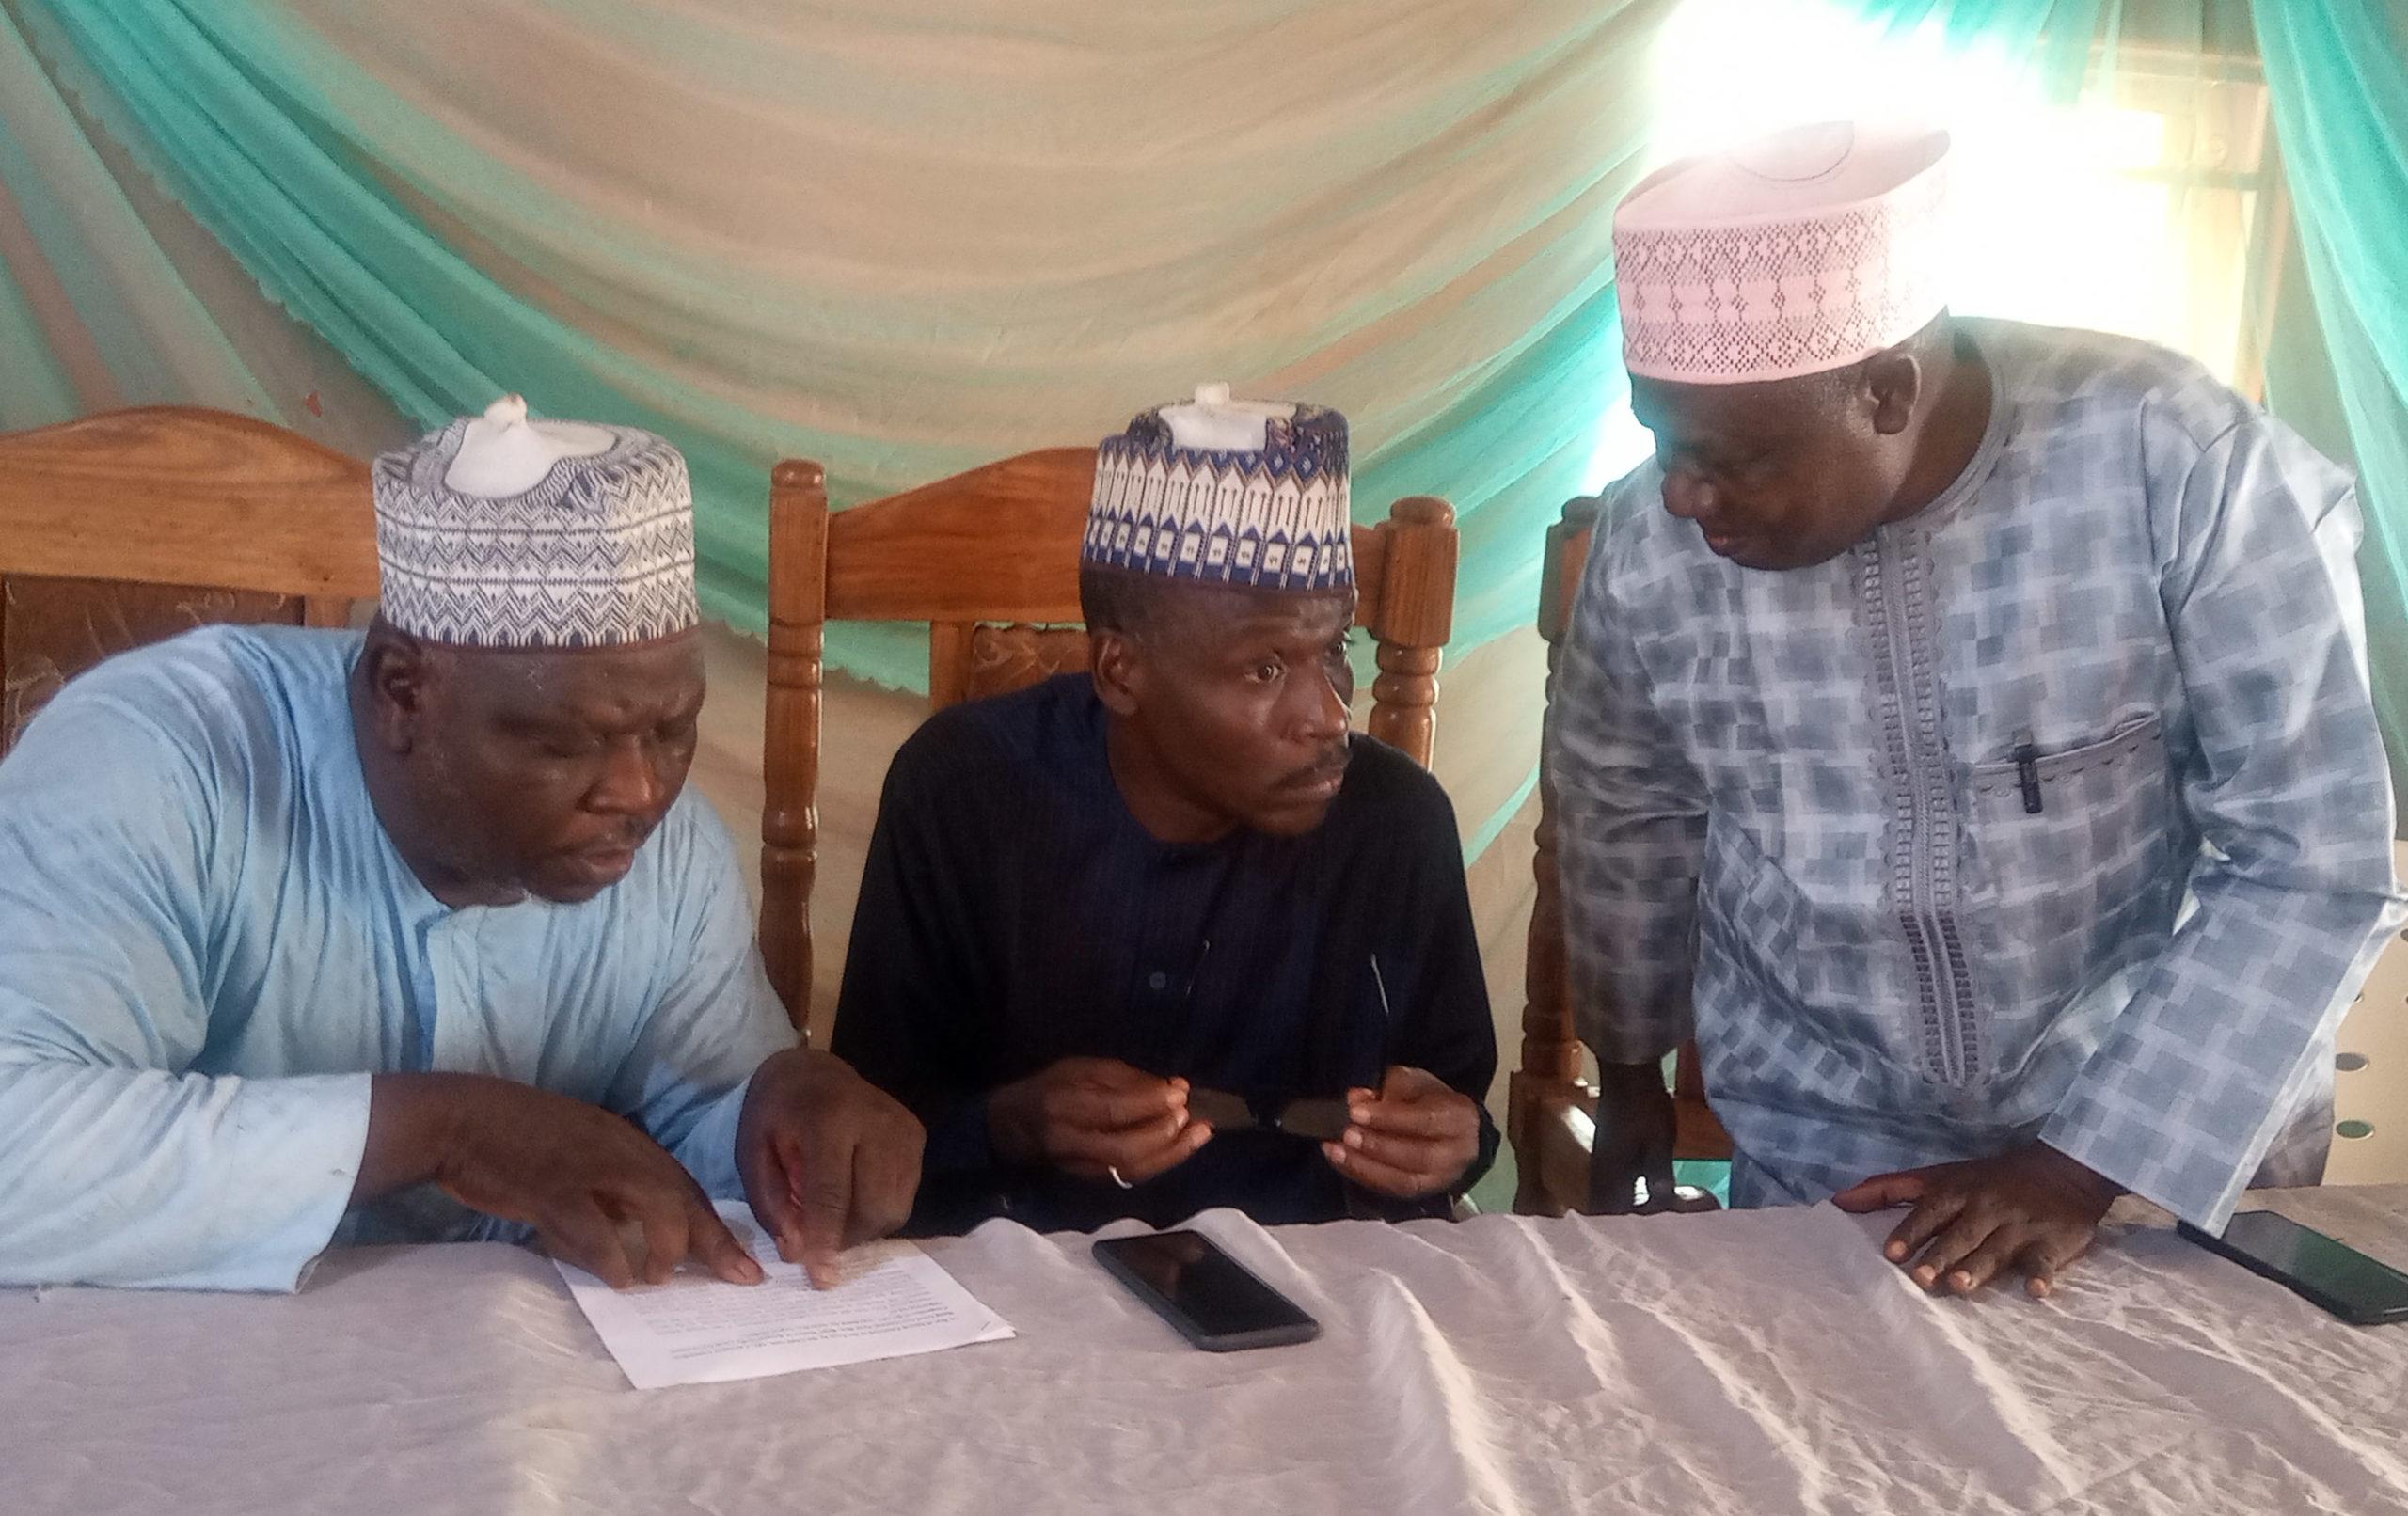 APC LG Congress: SGF Mustapha's kinsmen unite to bring back party's glory in Adamawa